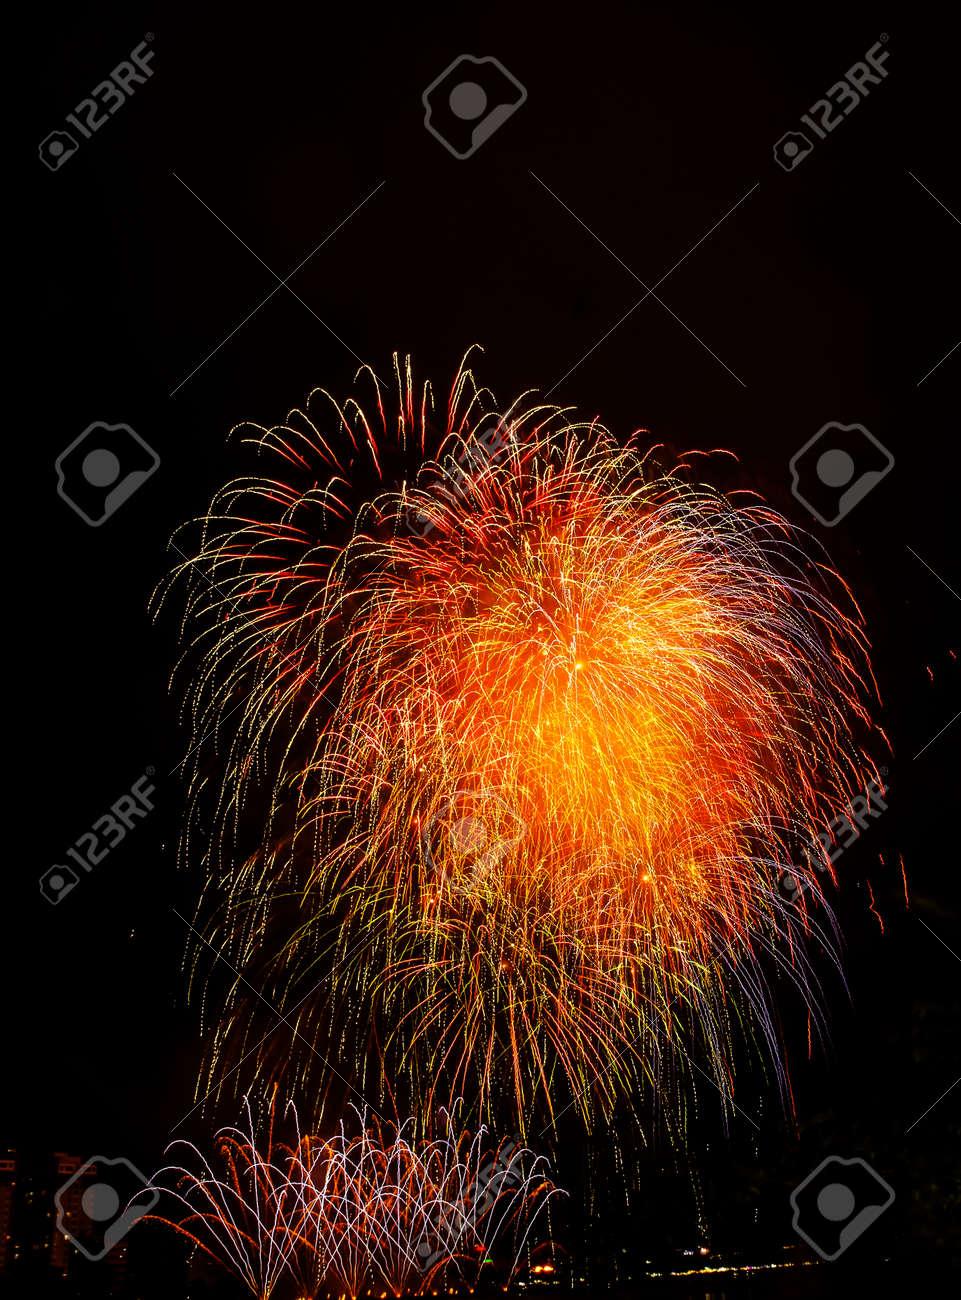 Happy New Year Diwali 2019 Hd Images 65